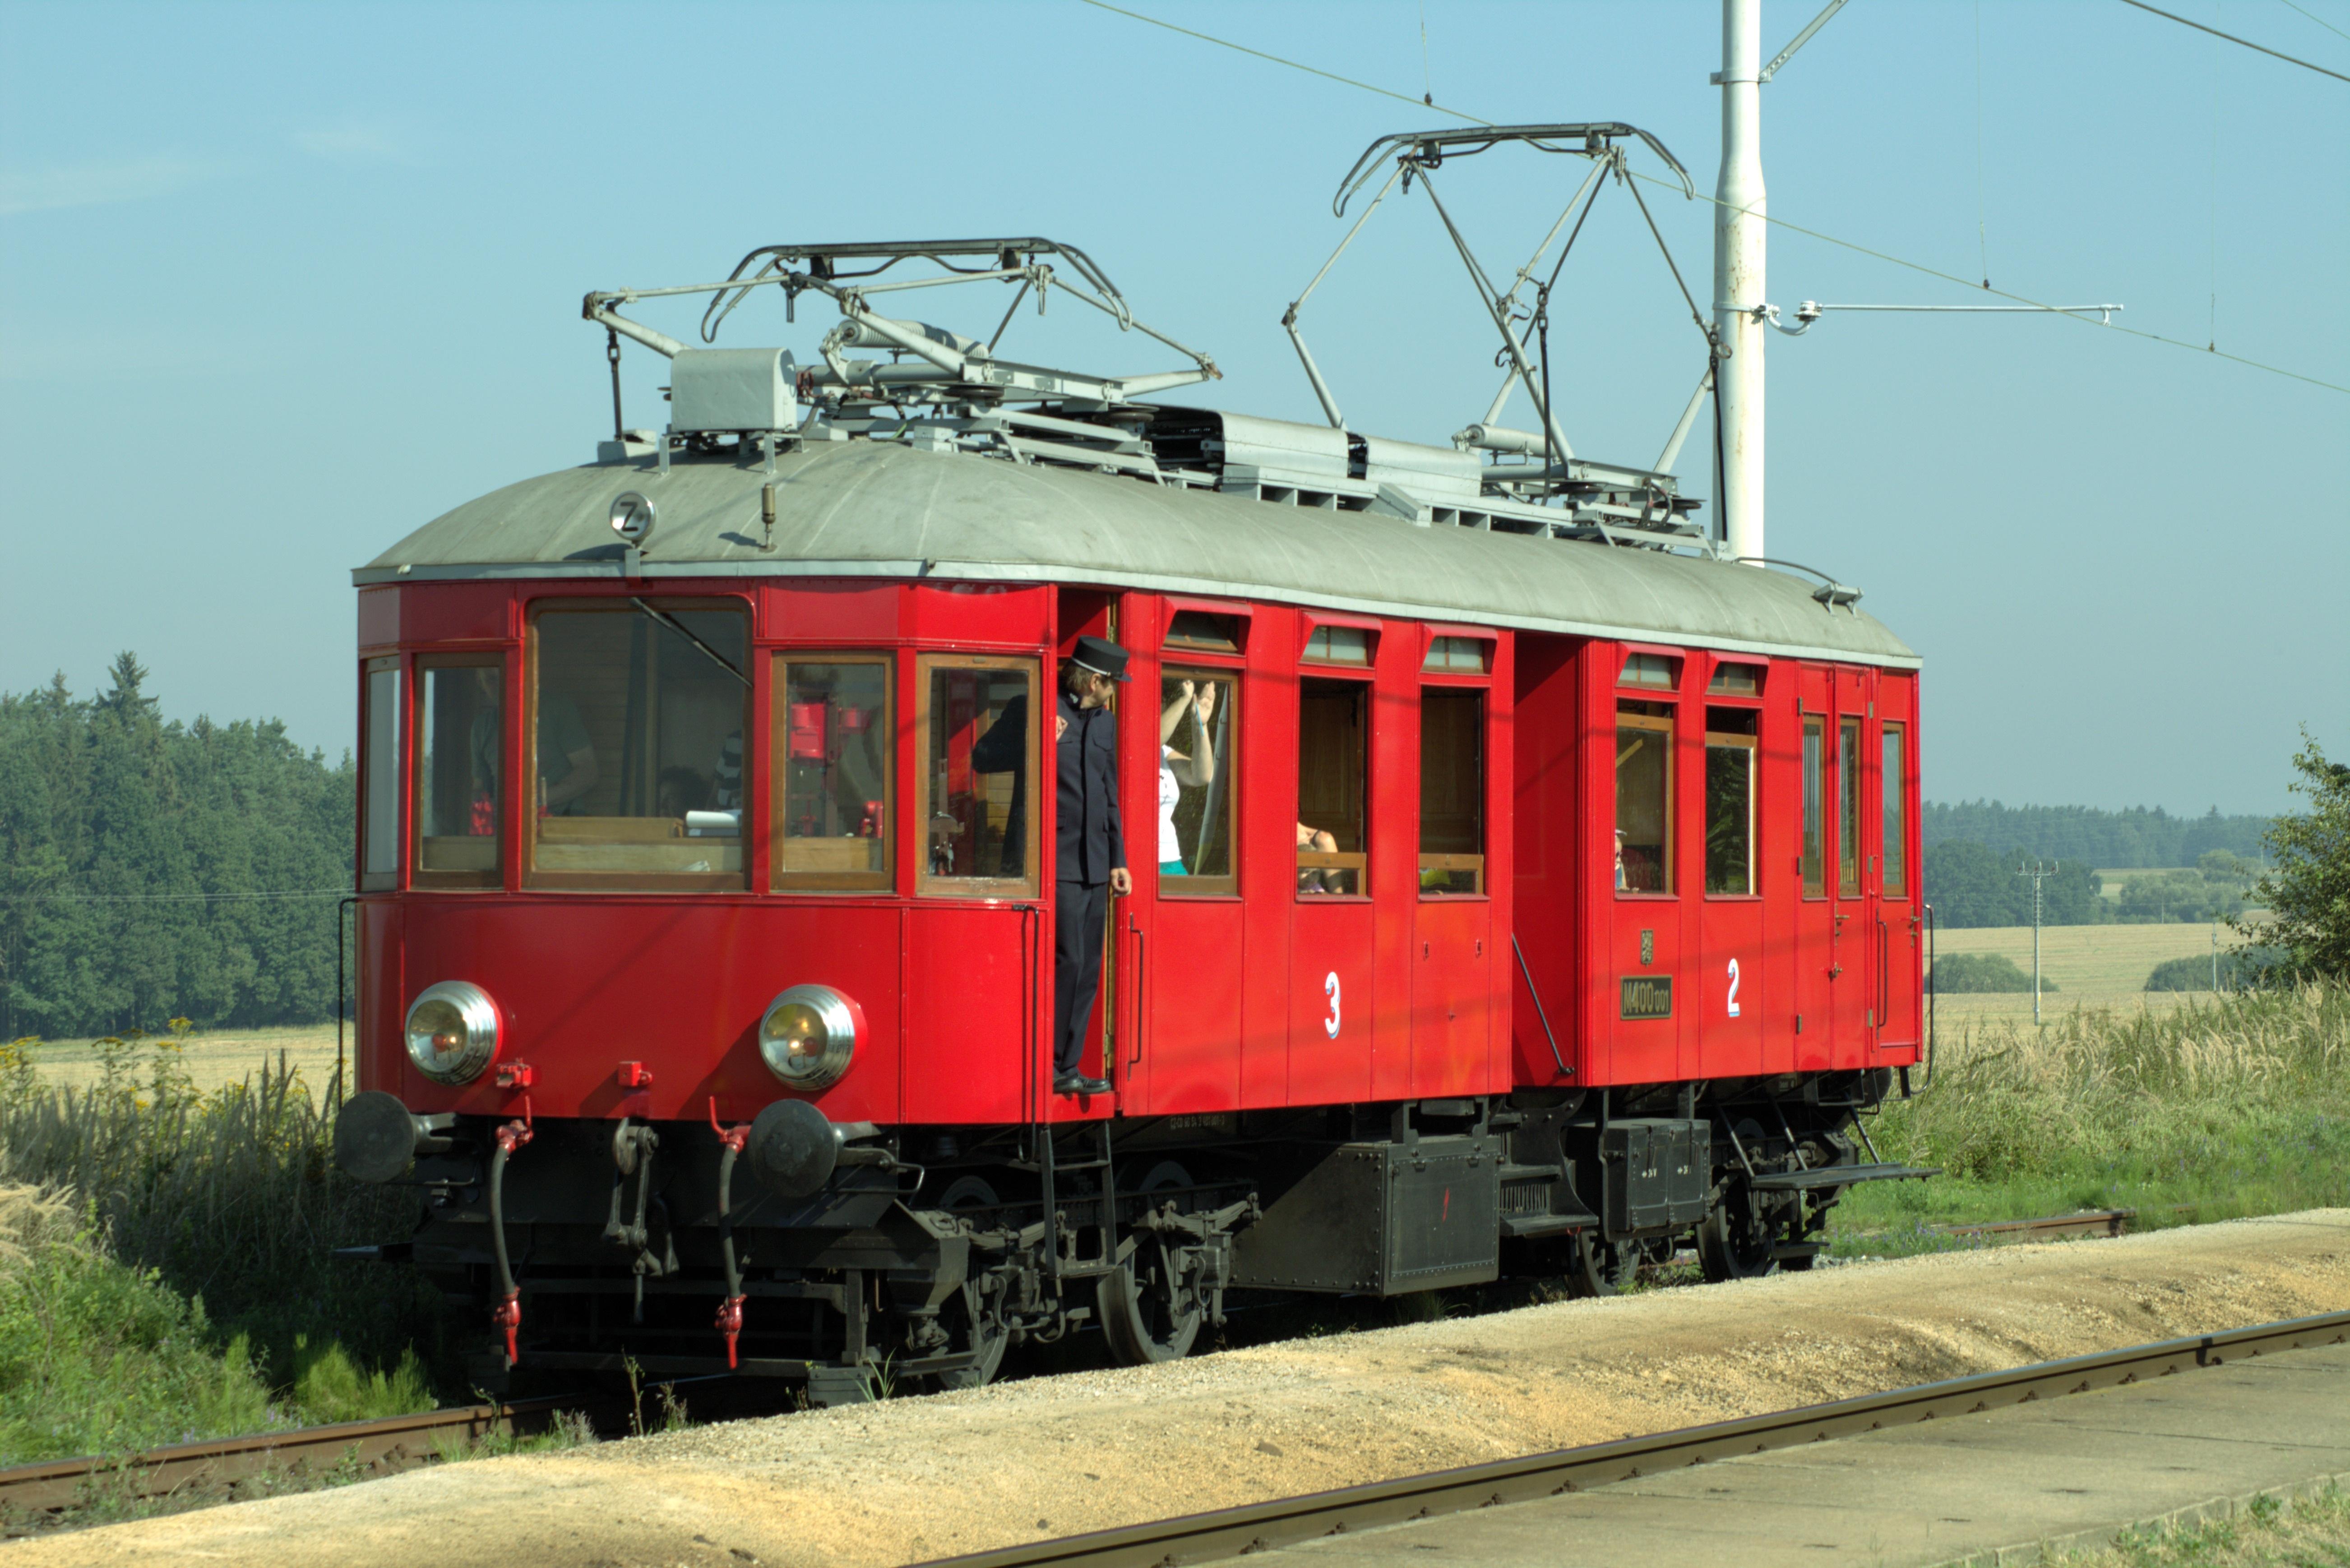 images gratuites piste chemin de fer vieux train tram rouge v hicule nostalgie. Black Bedroom Furniture Sets. Home Design Ideas